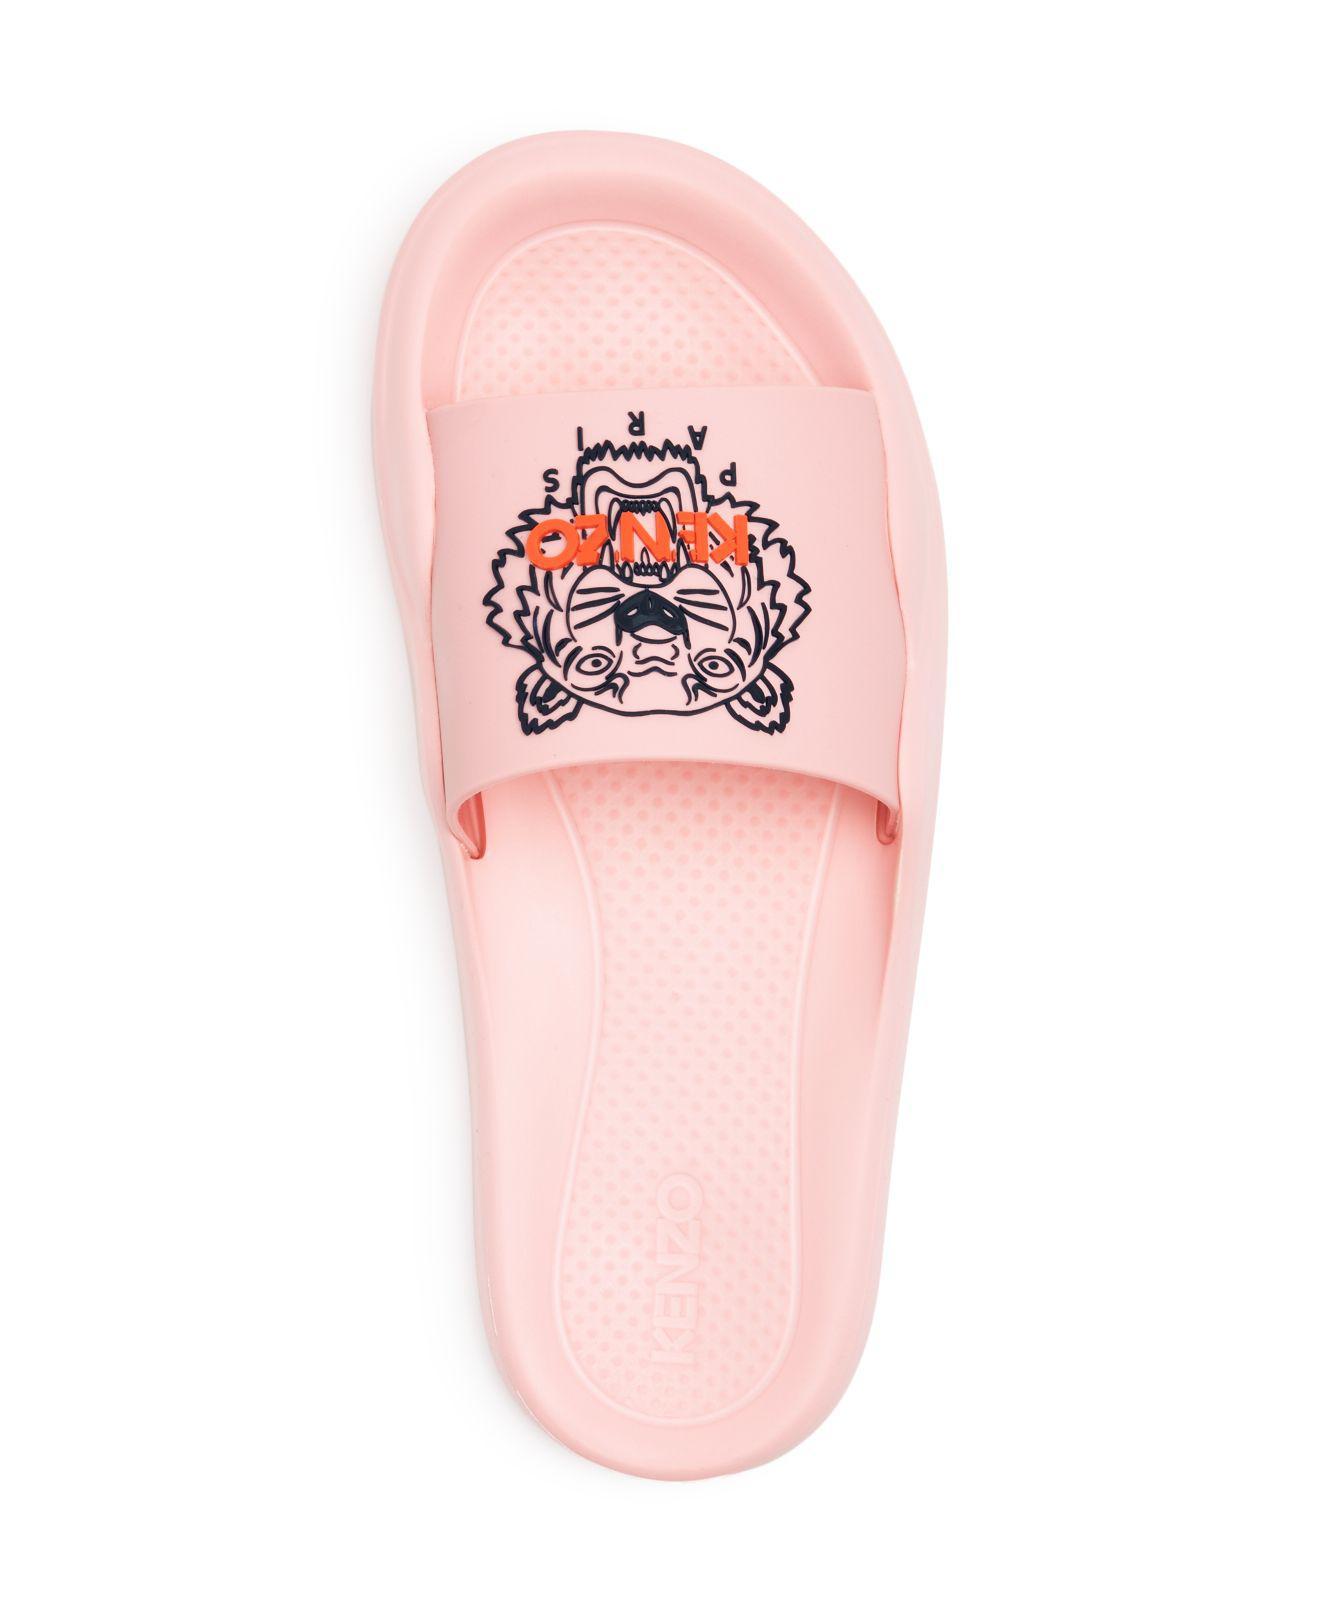 Kenzo Women's City Pool Slide Sandals